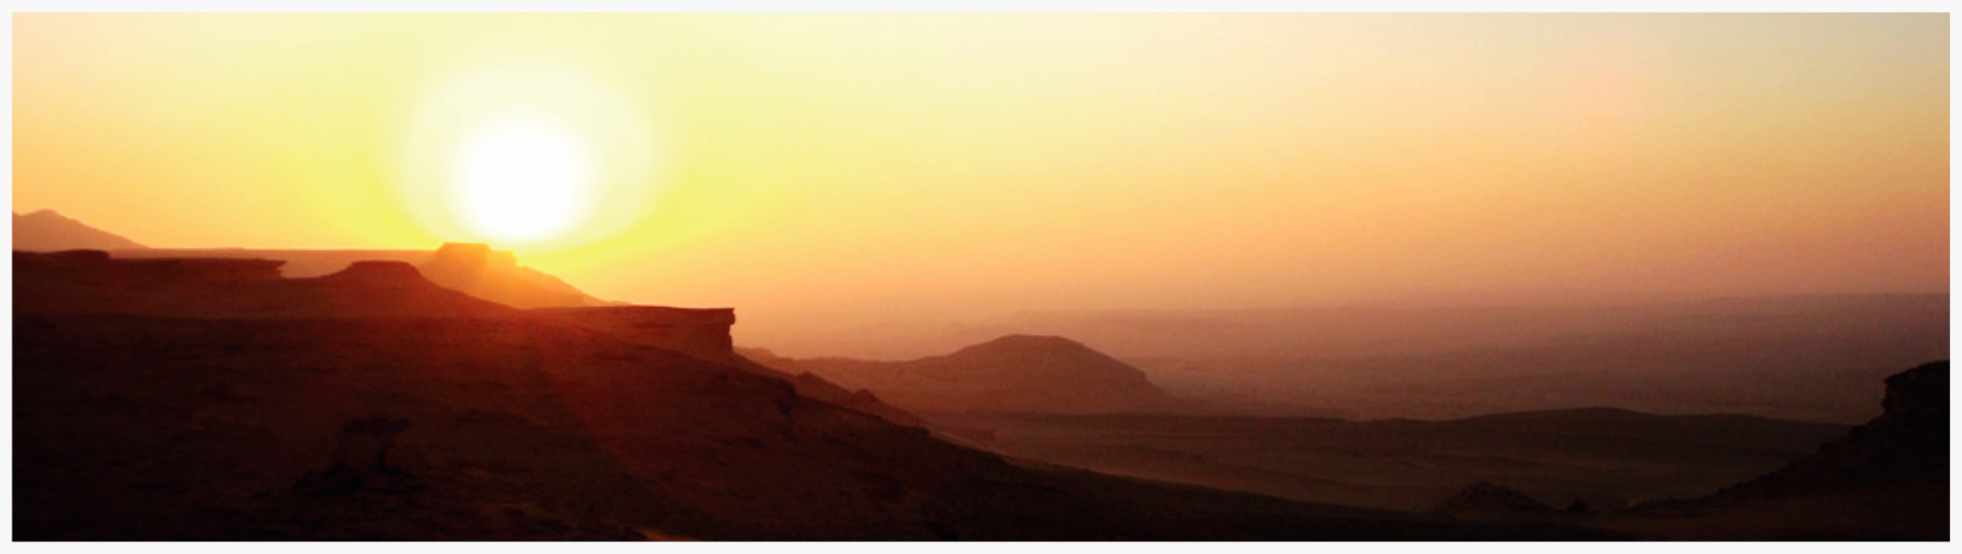 The sun sets over the Fayum Depression, Egypt. K.L. Allen (c) 2010